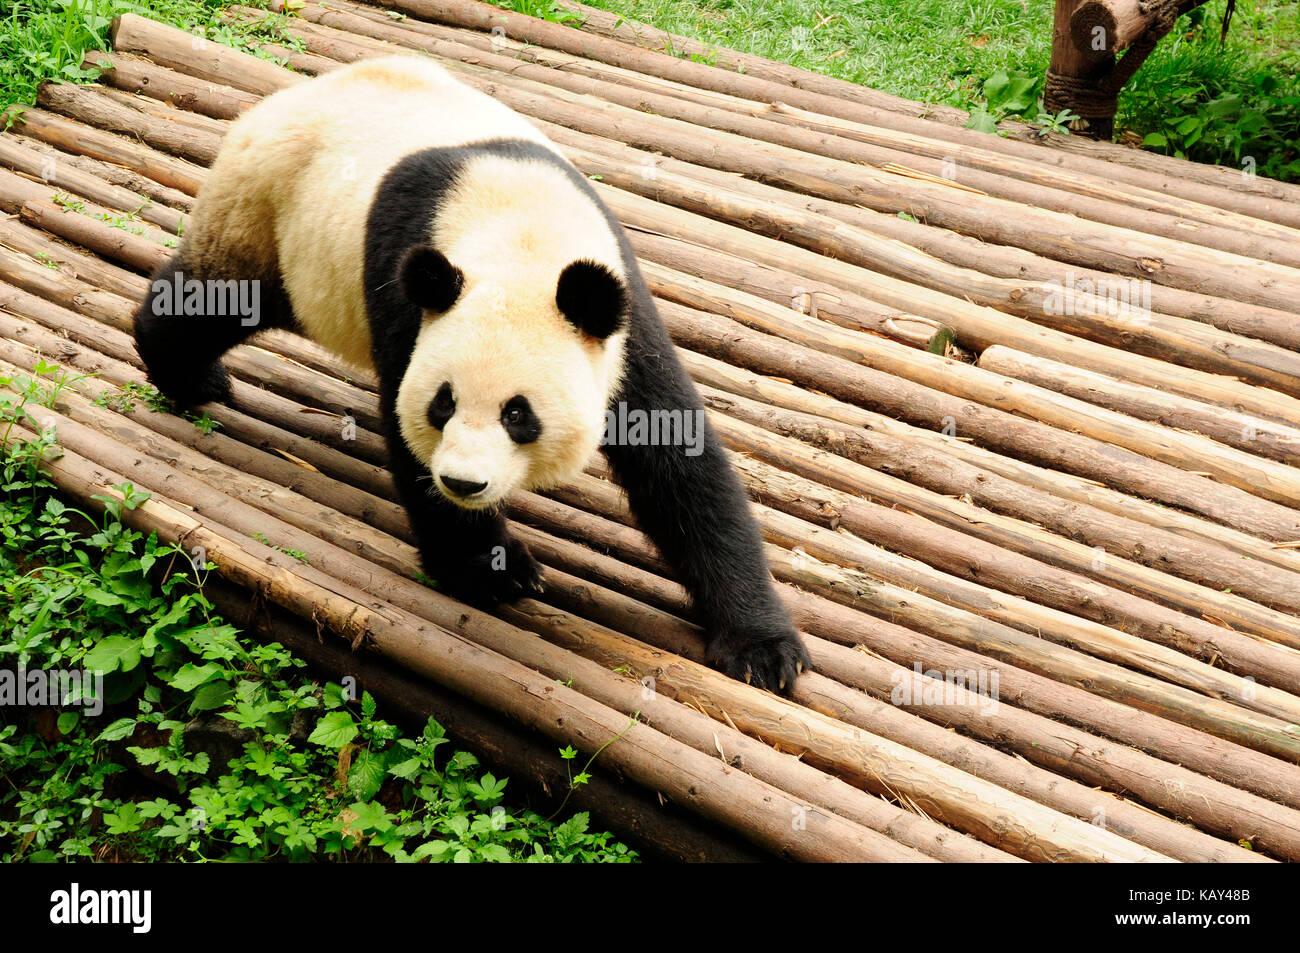 Giant panda at the Chengdu Research Base of Giant Panda Breeding, Chengdu, Sichuan, China - Stock Image